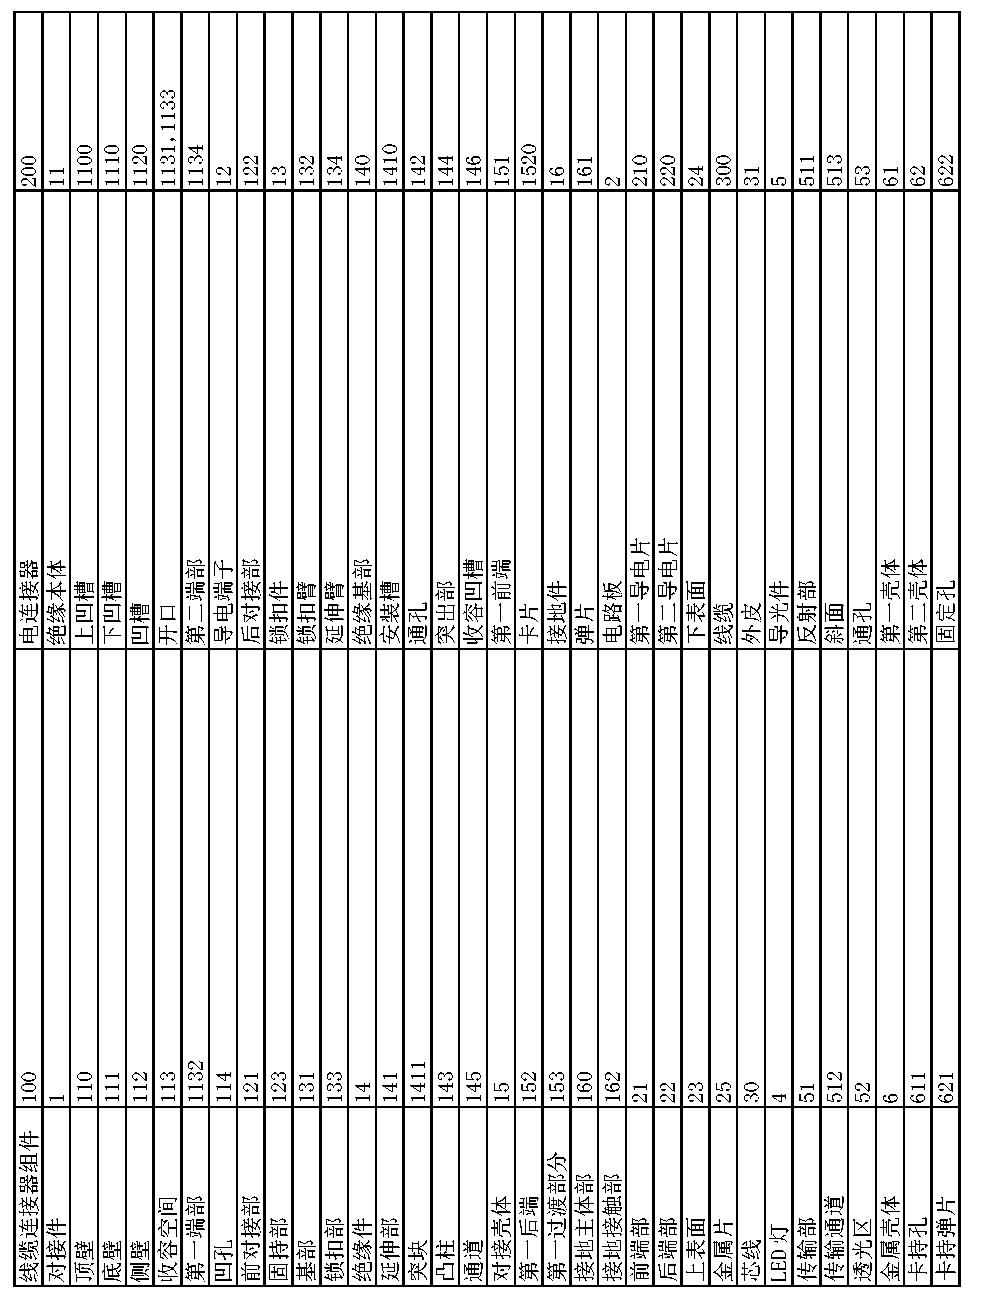 Figure CN204243389UD00051